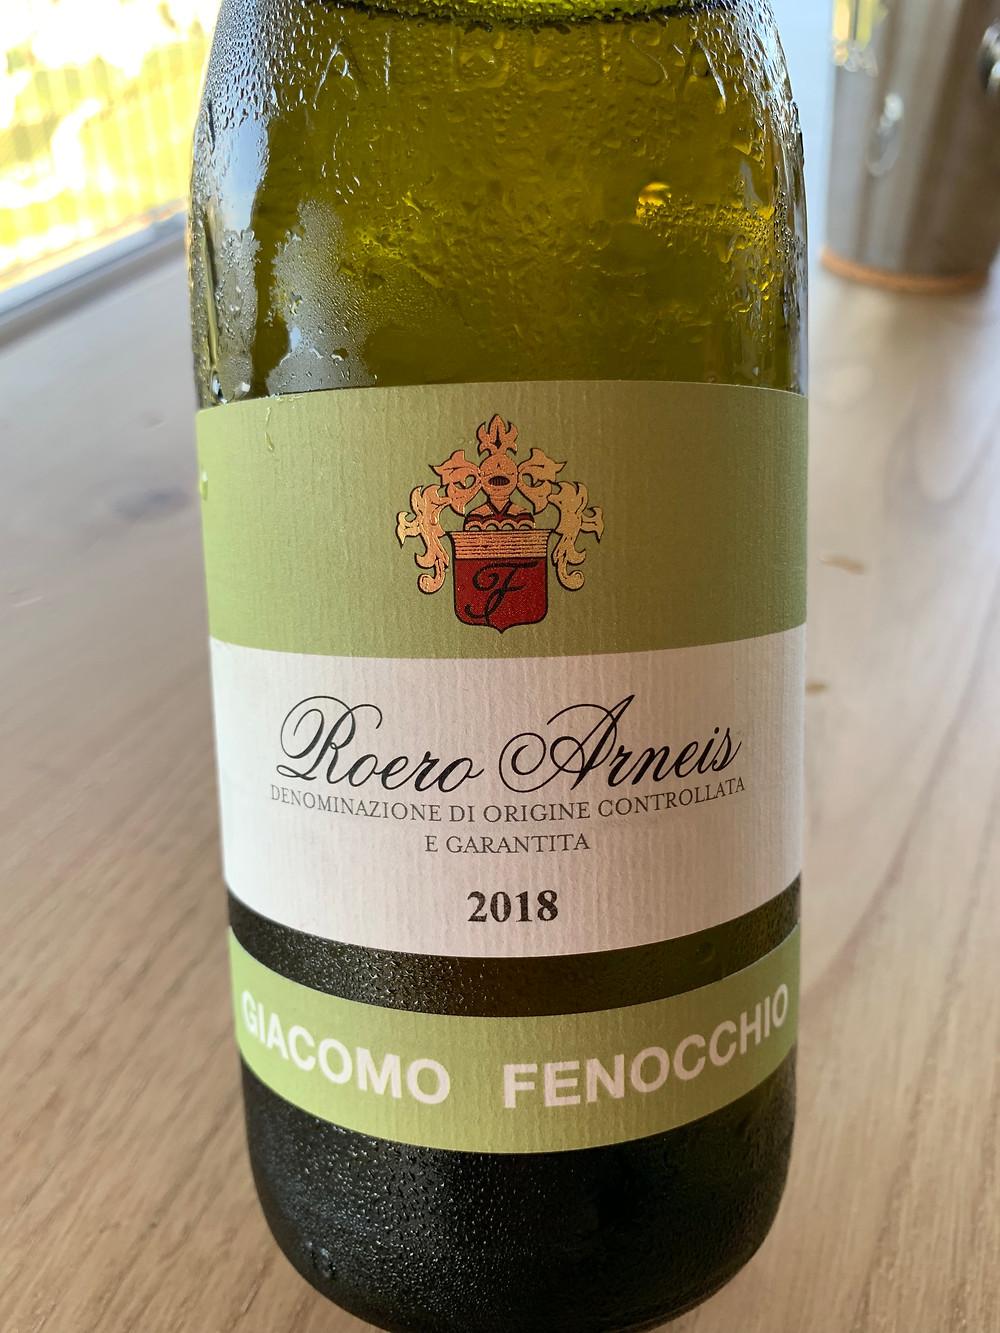 Giacomo Fenocchio, Barolo, Piemonte